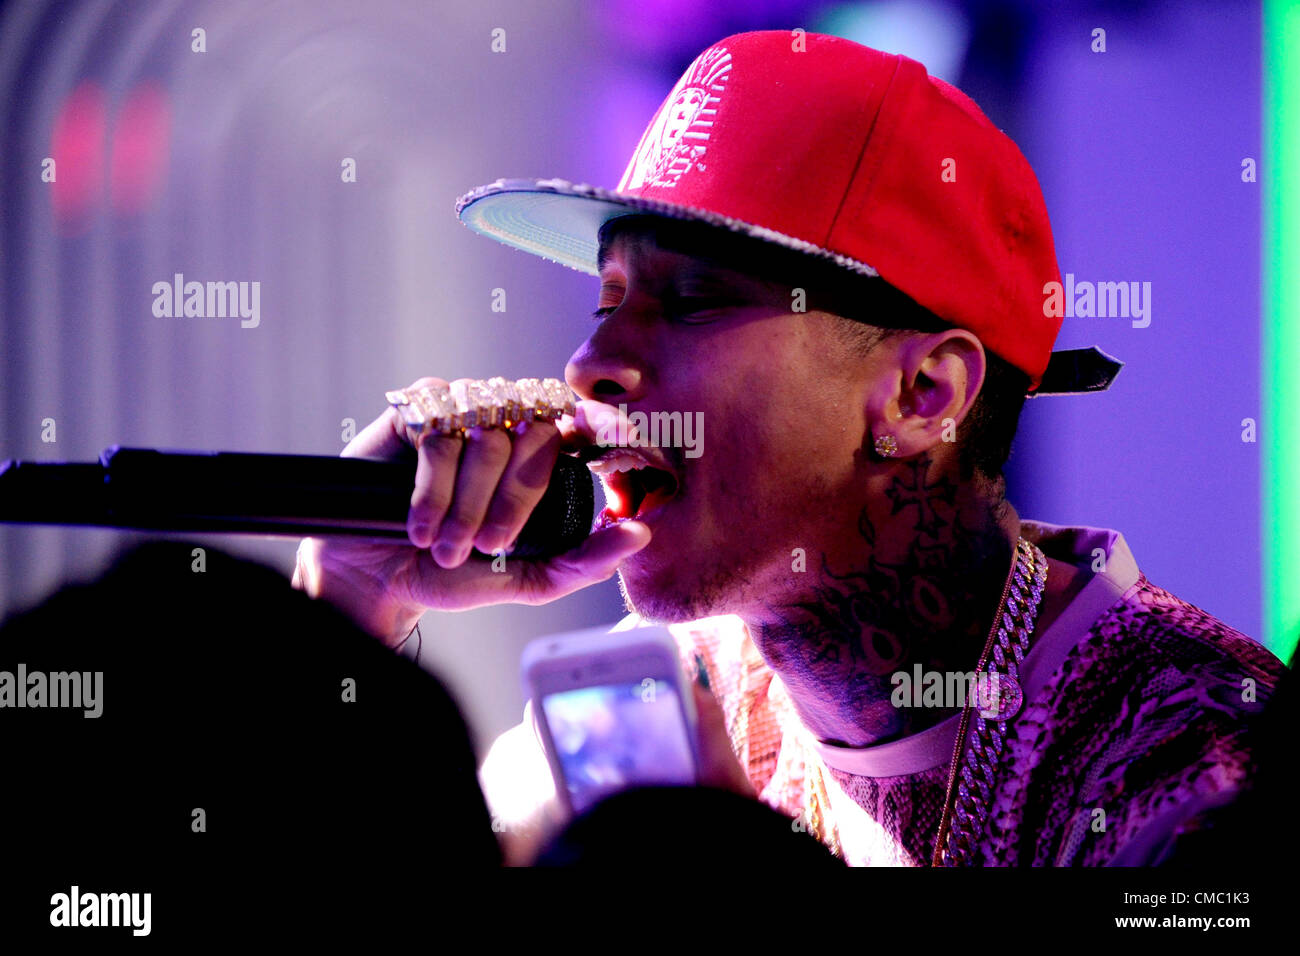 July 13, 2012 - Toronto, Canada - Rapper Tyga appears on Canadian TV